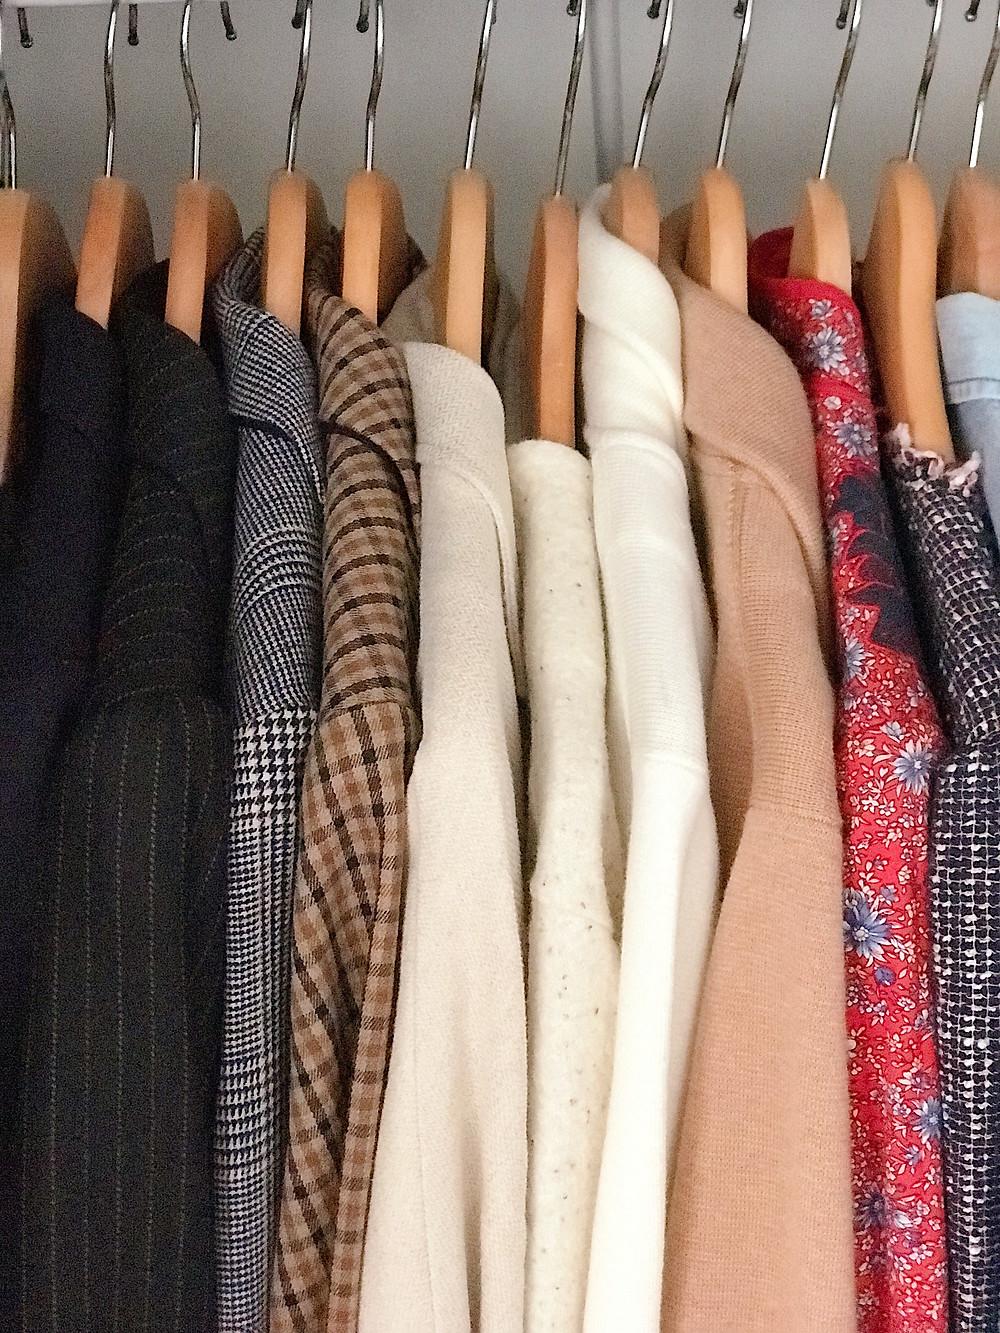 blazers hung in a closet